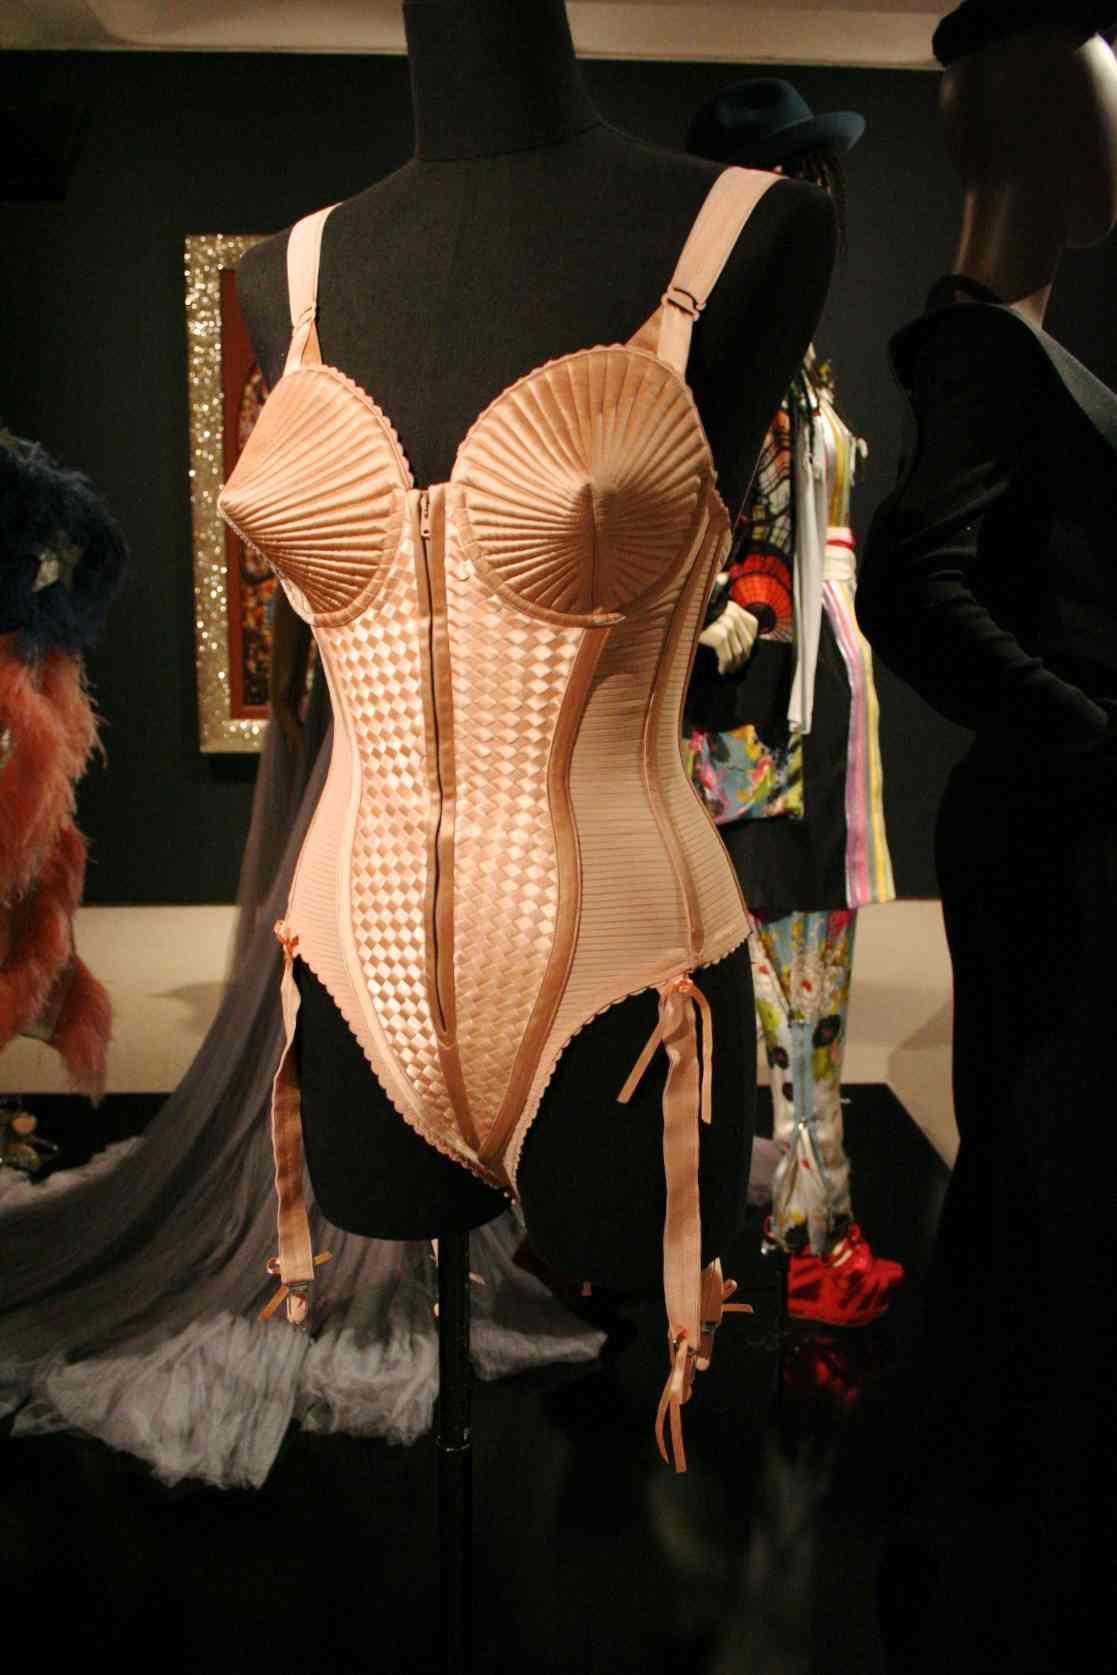 f1c30c832db Madonna corset - John Paul Gaultier Exhibition